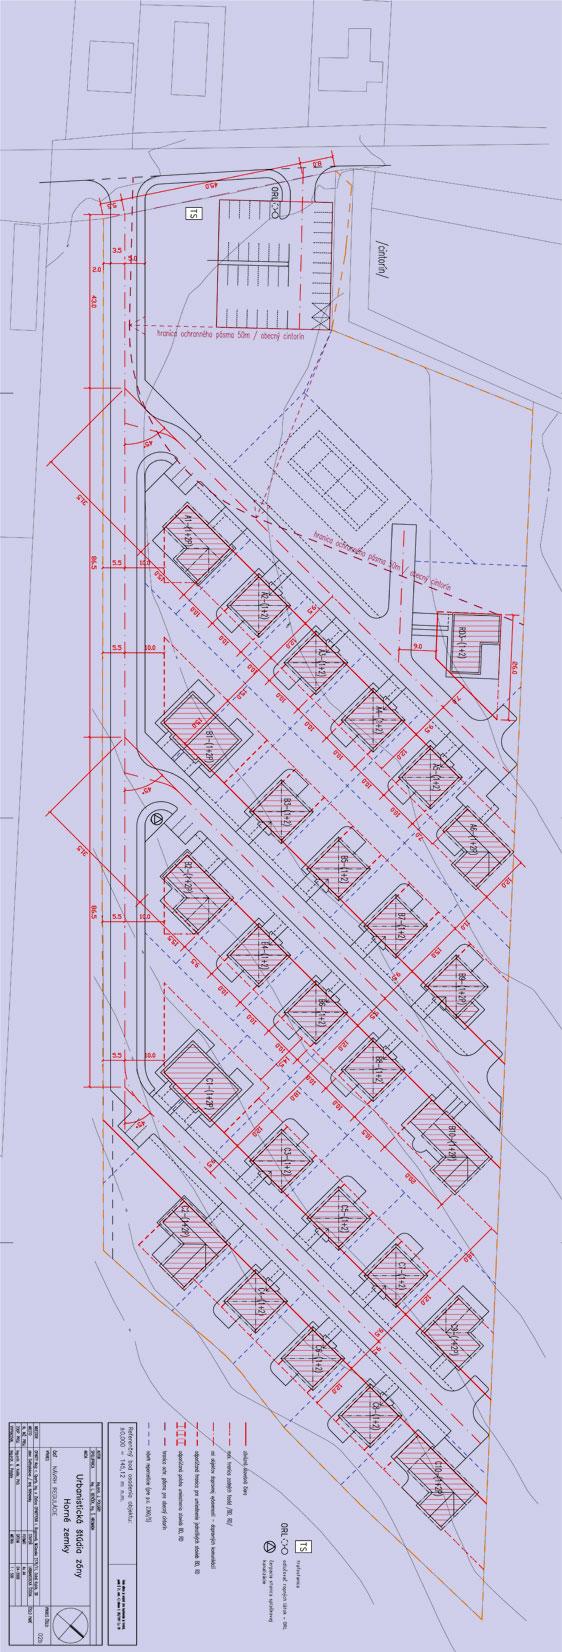 Pozerate obrazky z galerie: Or. Lesna - okolie Individuálna bytová výstavba - Svätoplukovo (okres NITRA)